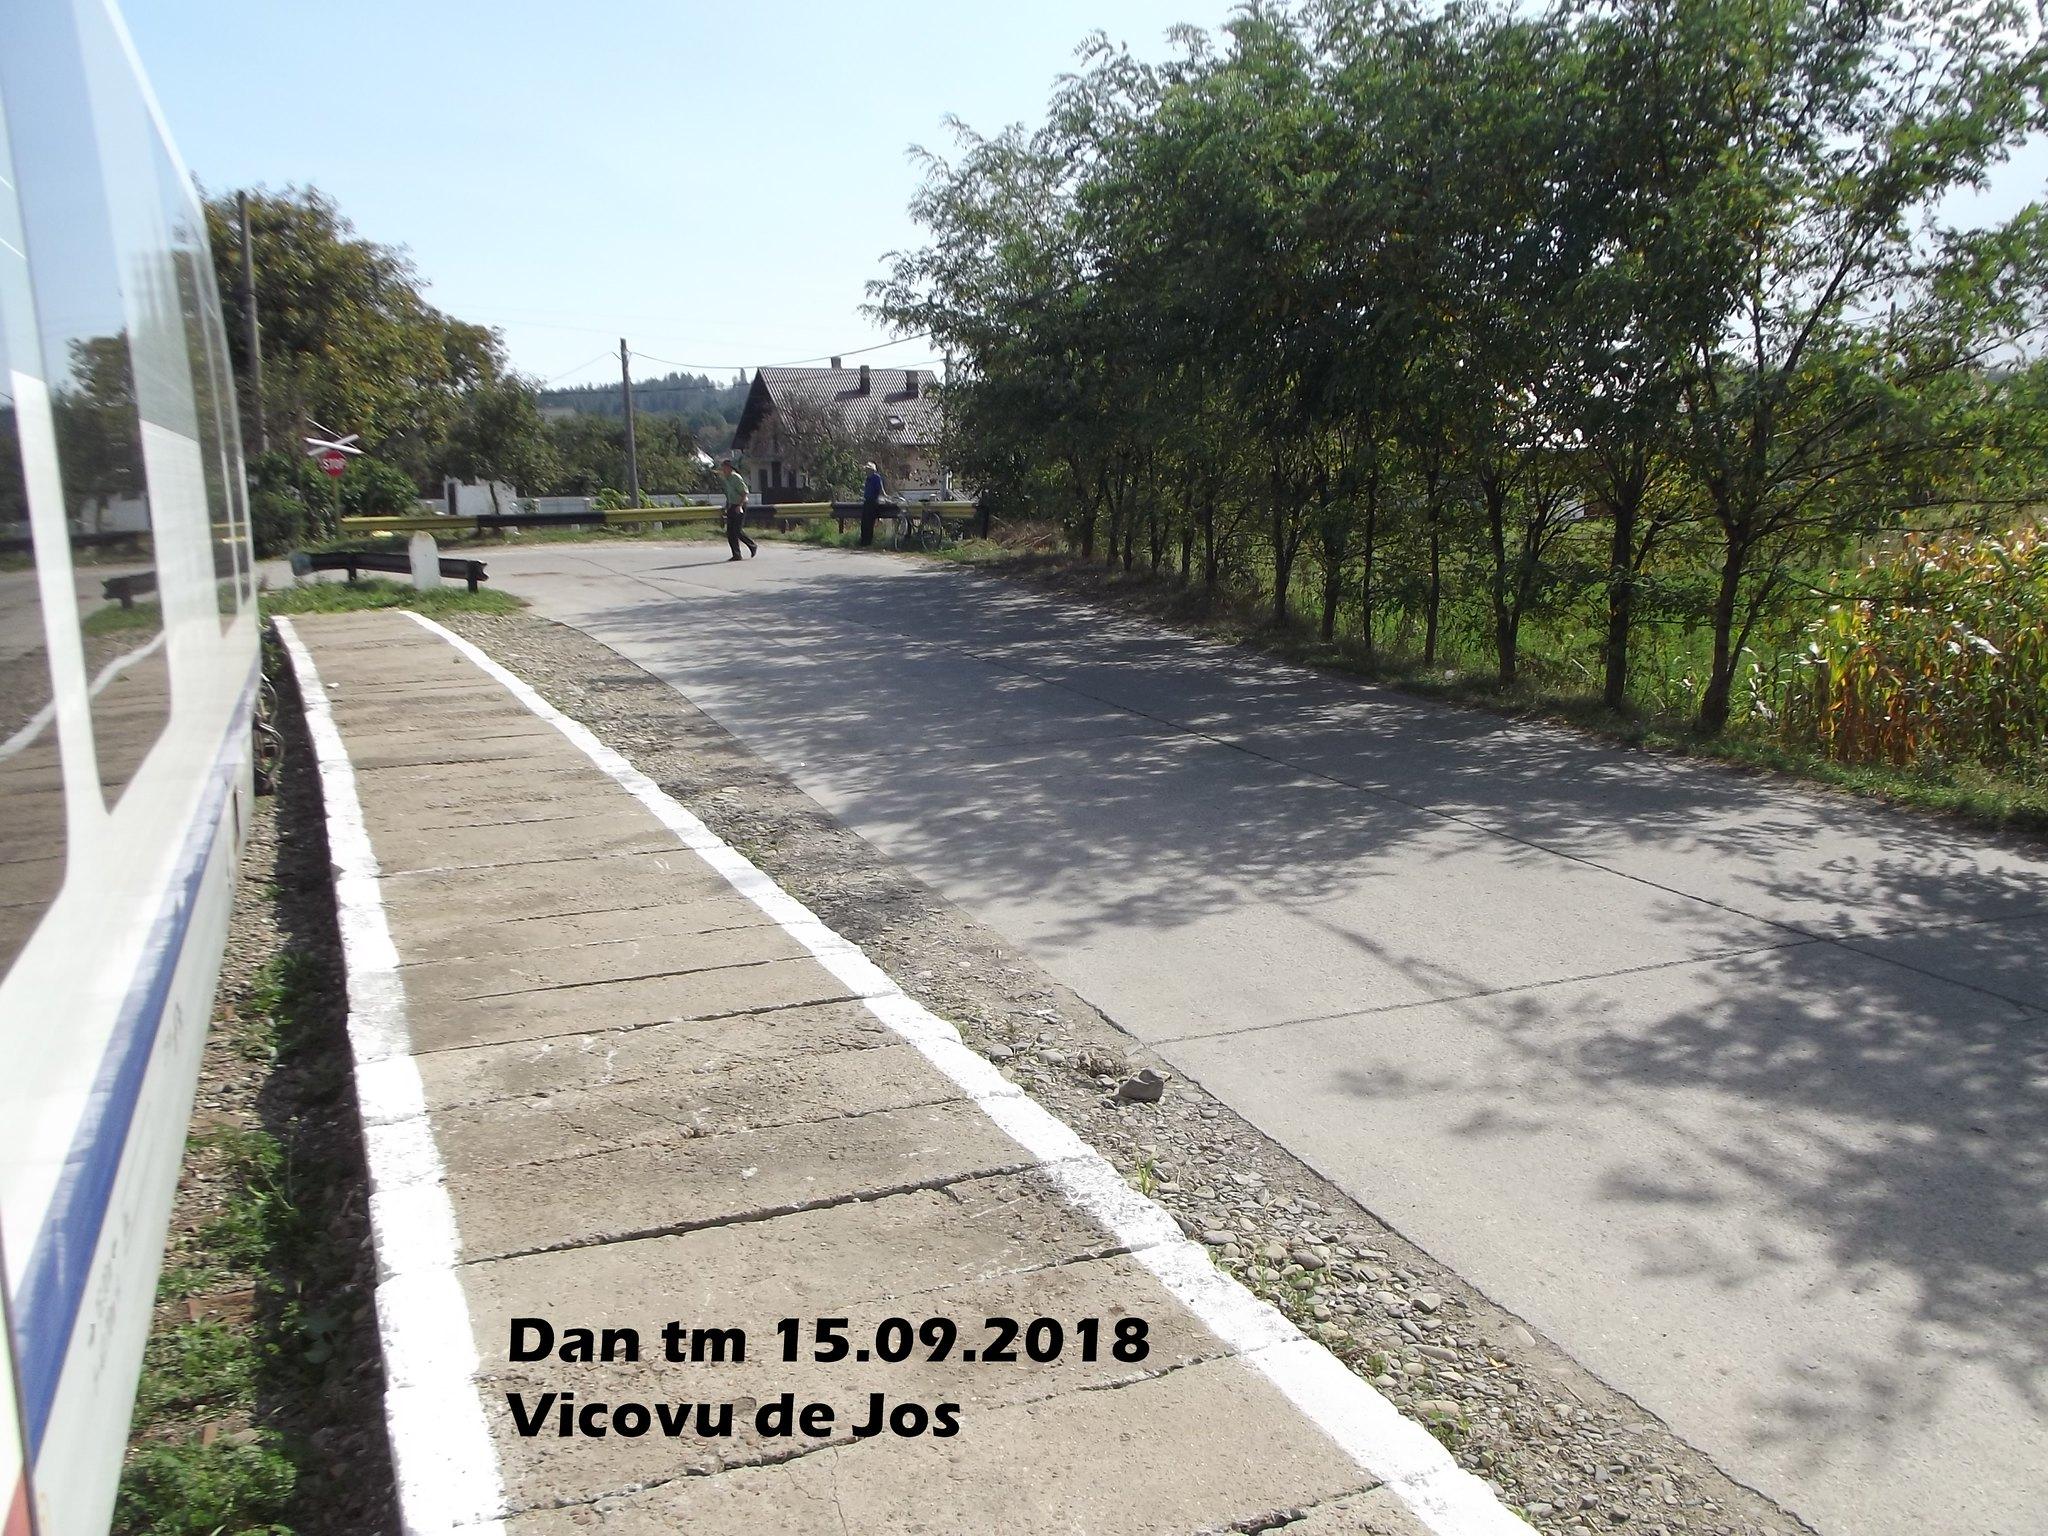 515 : Dorneşti - Gura Putnei - (Putna) - Nisipitu - Seletin UKR - Pagina 47 44685368012_1986ccdd99_k